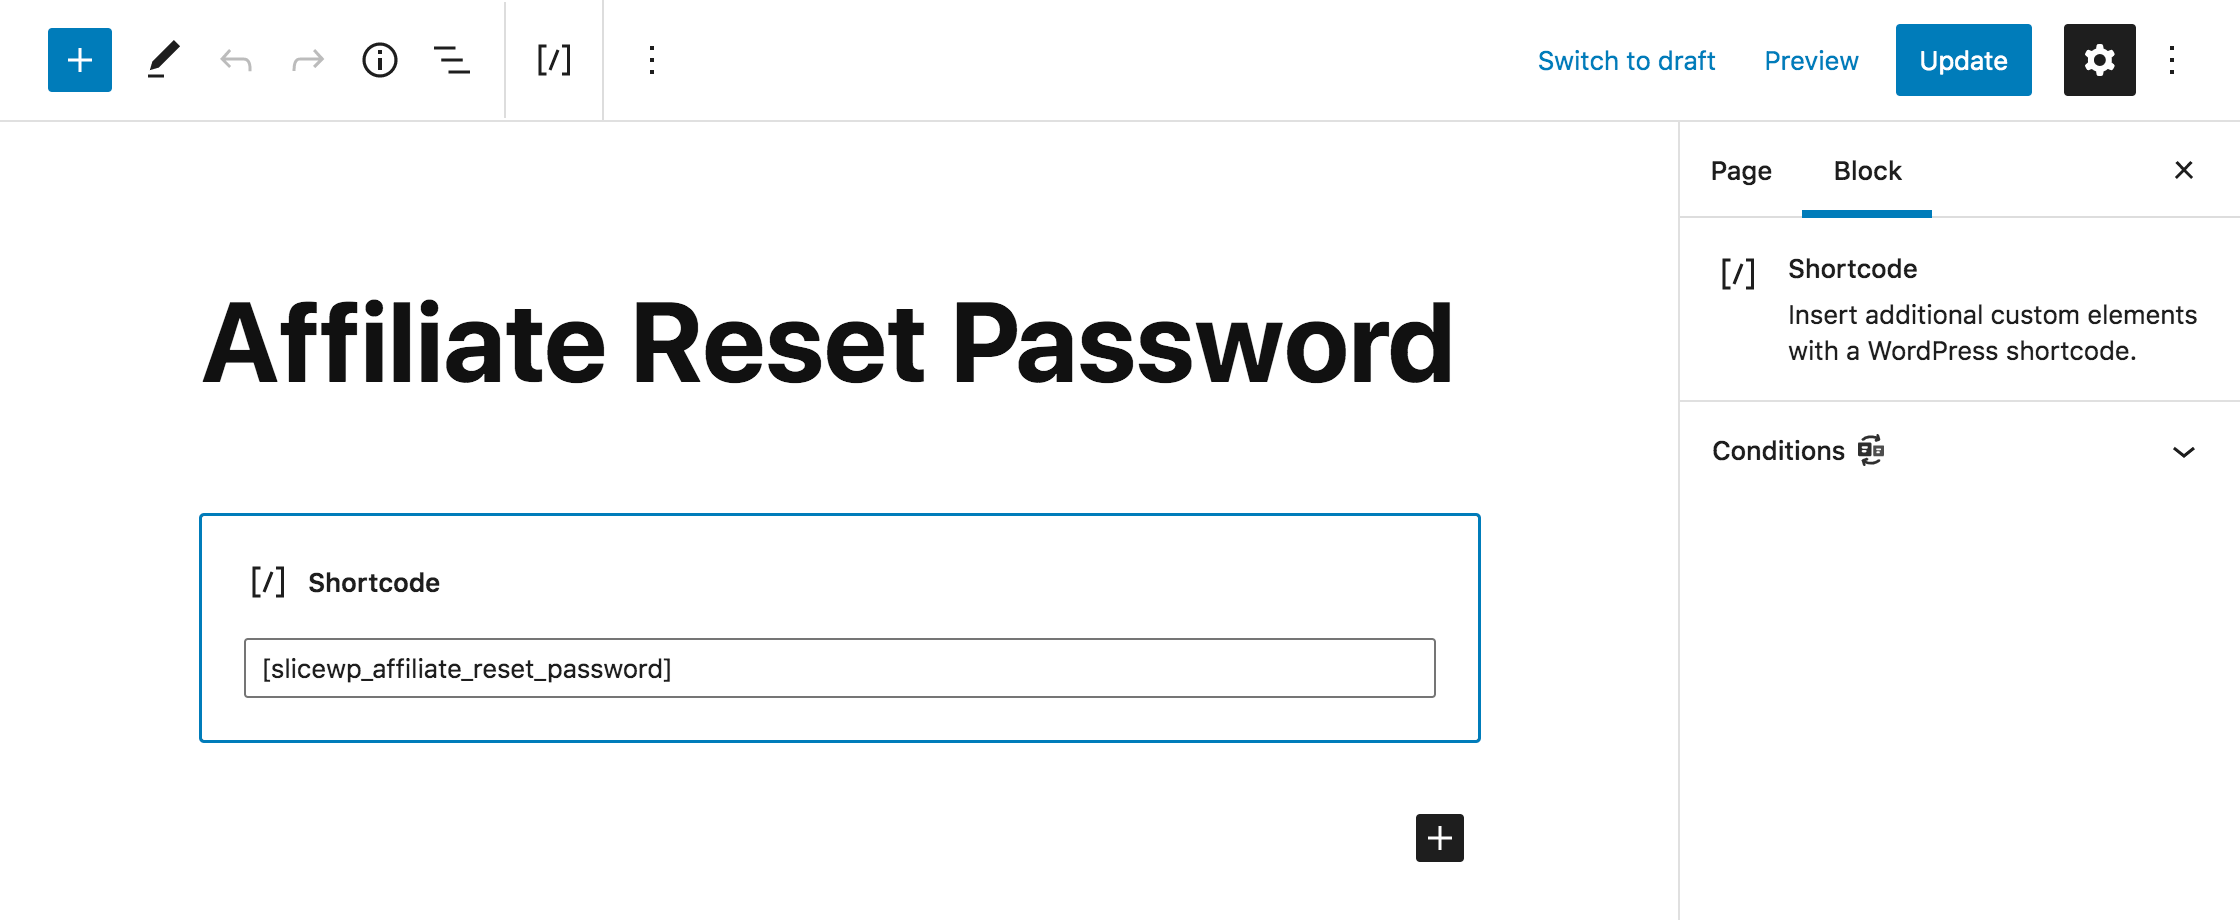 Affiliate reset password edit page in WordPress.